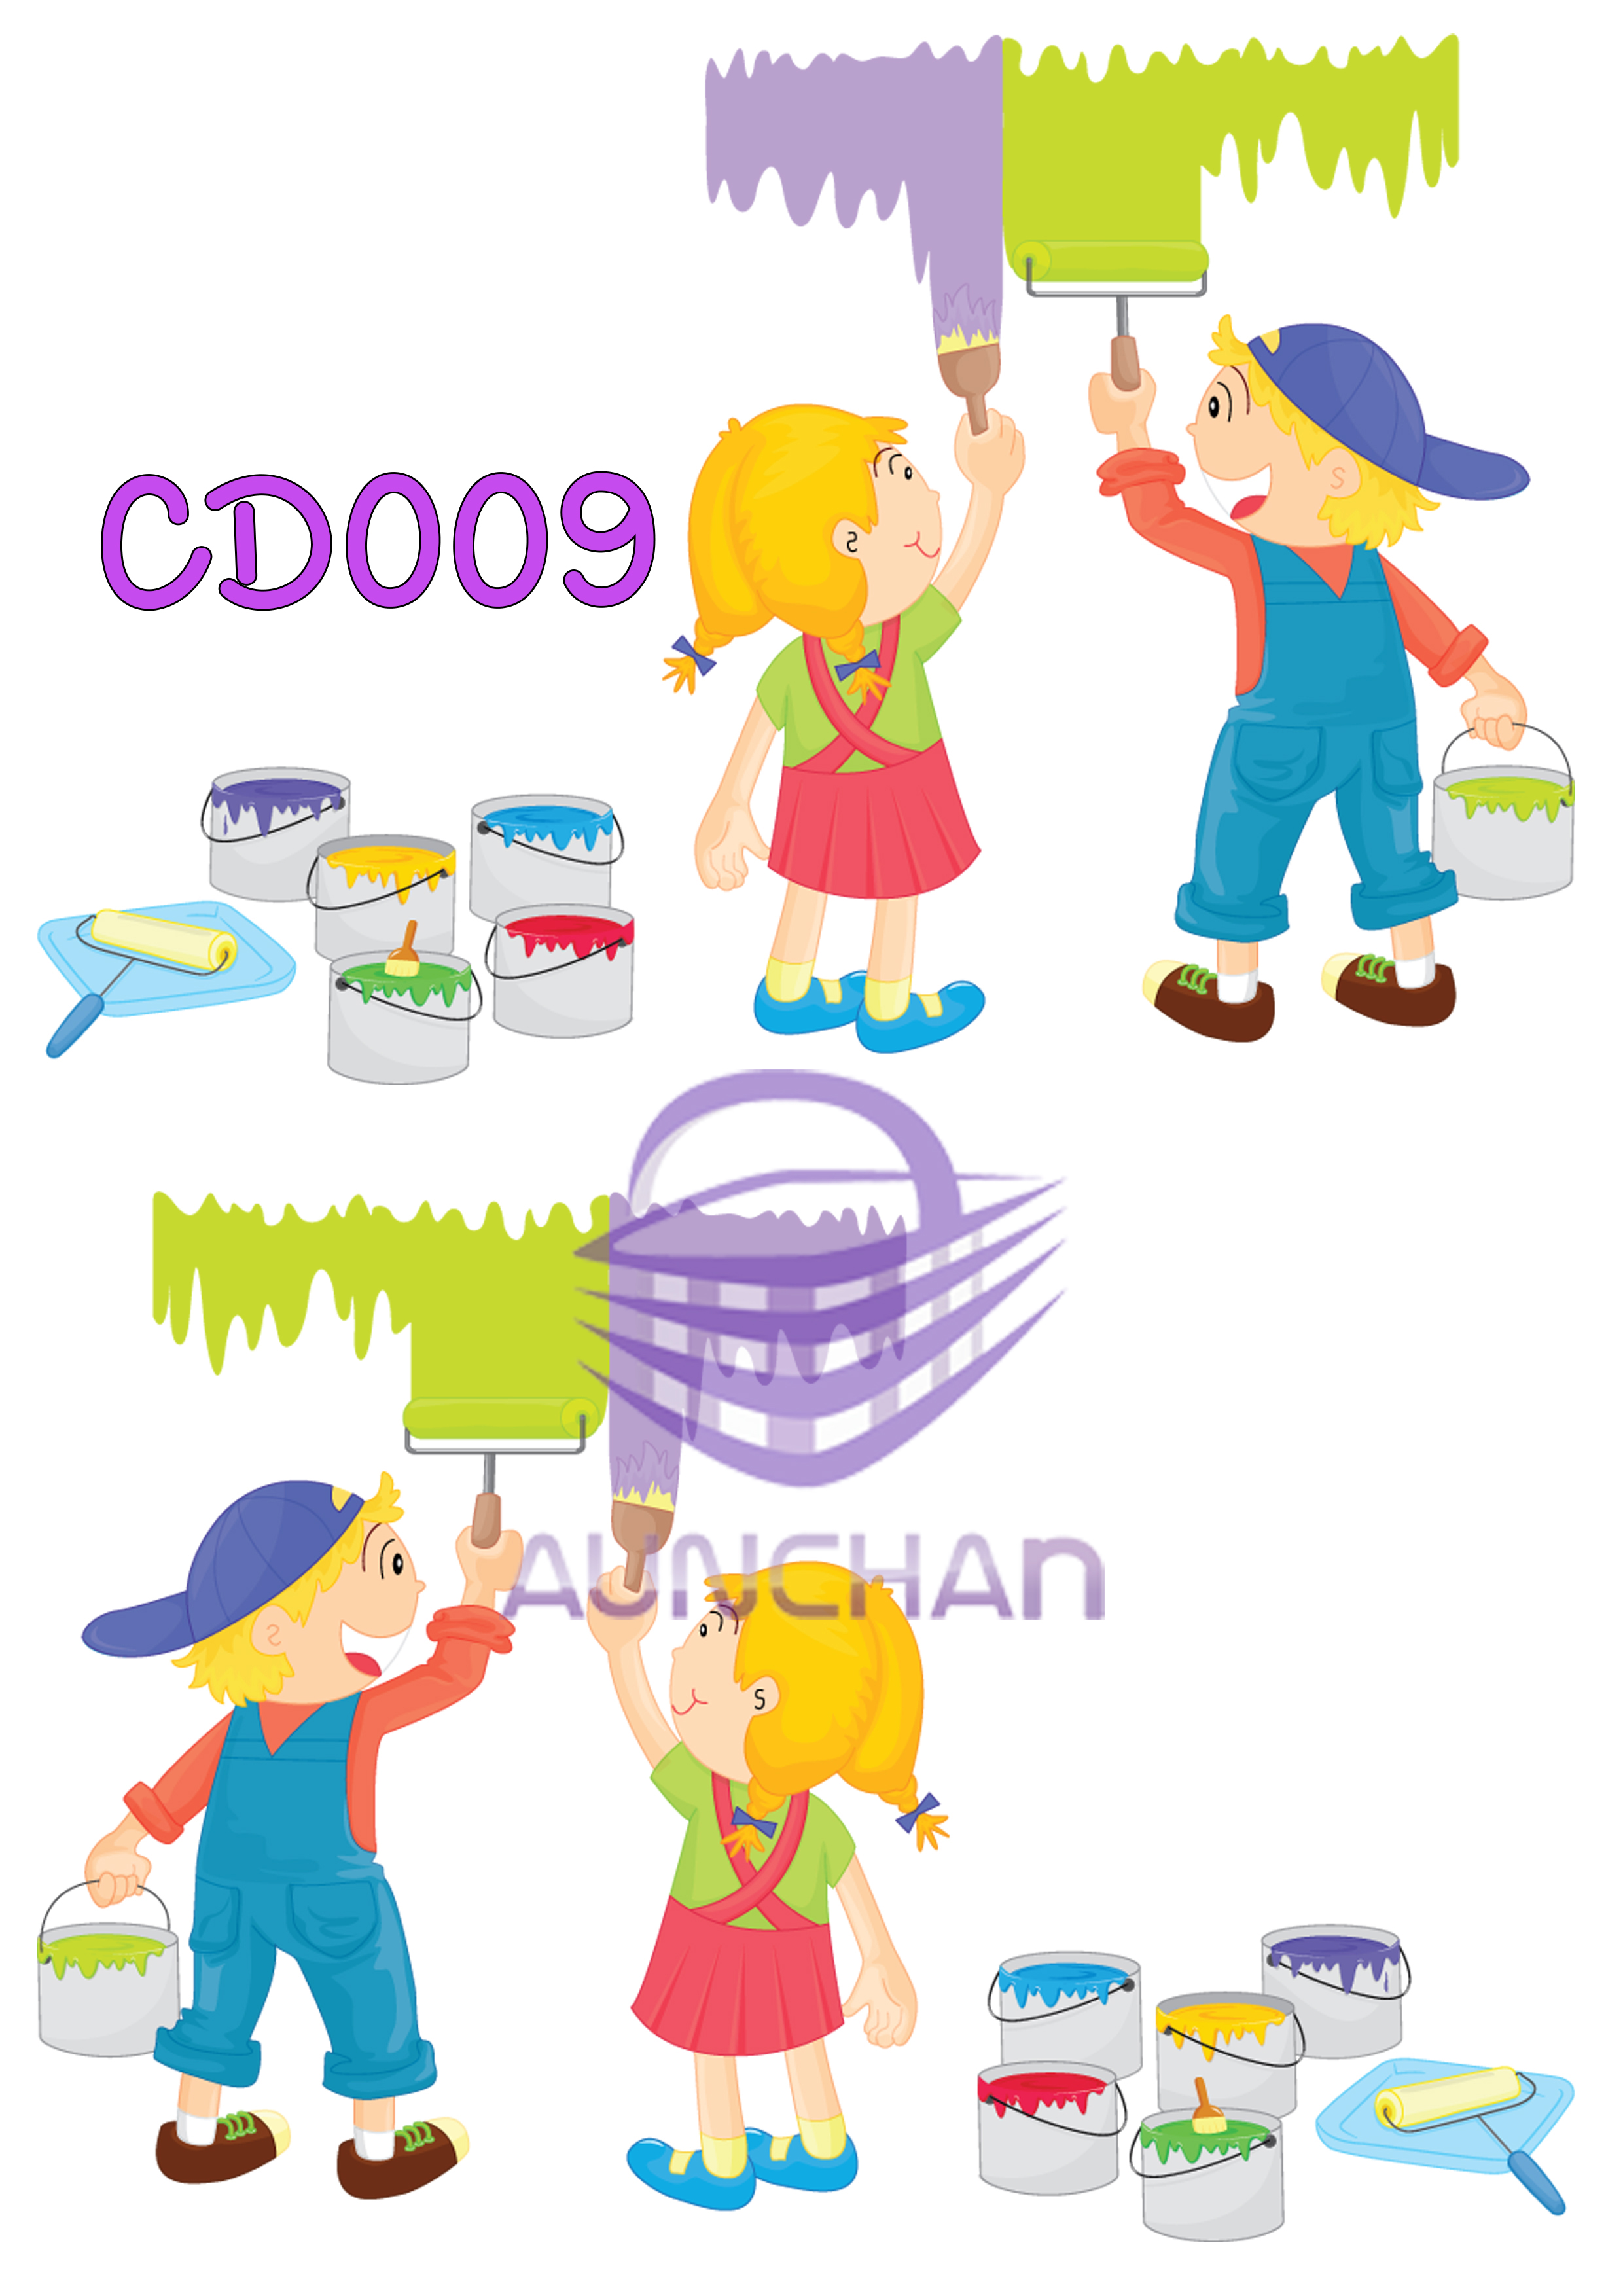 CD009 กระดาษแนพกิ้น 21x30ซม. ลายเด็ก